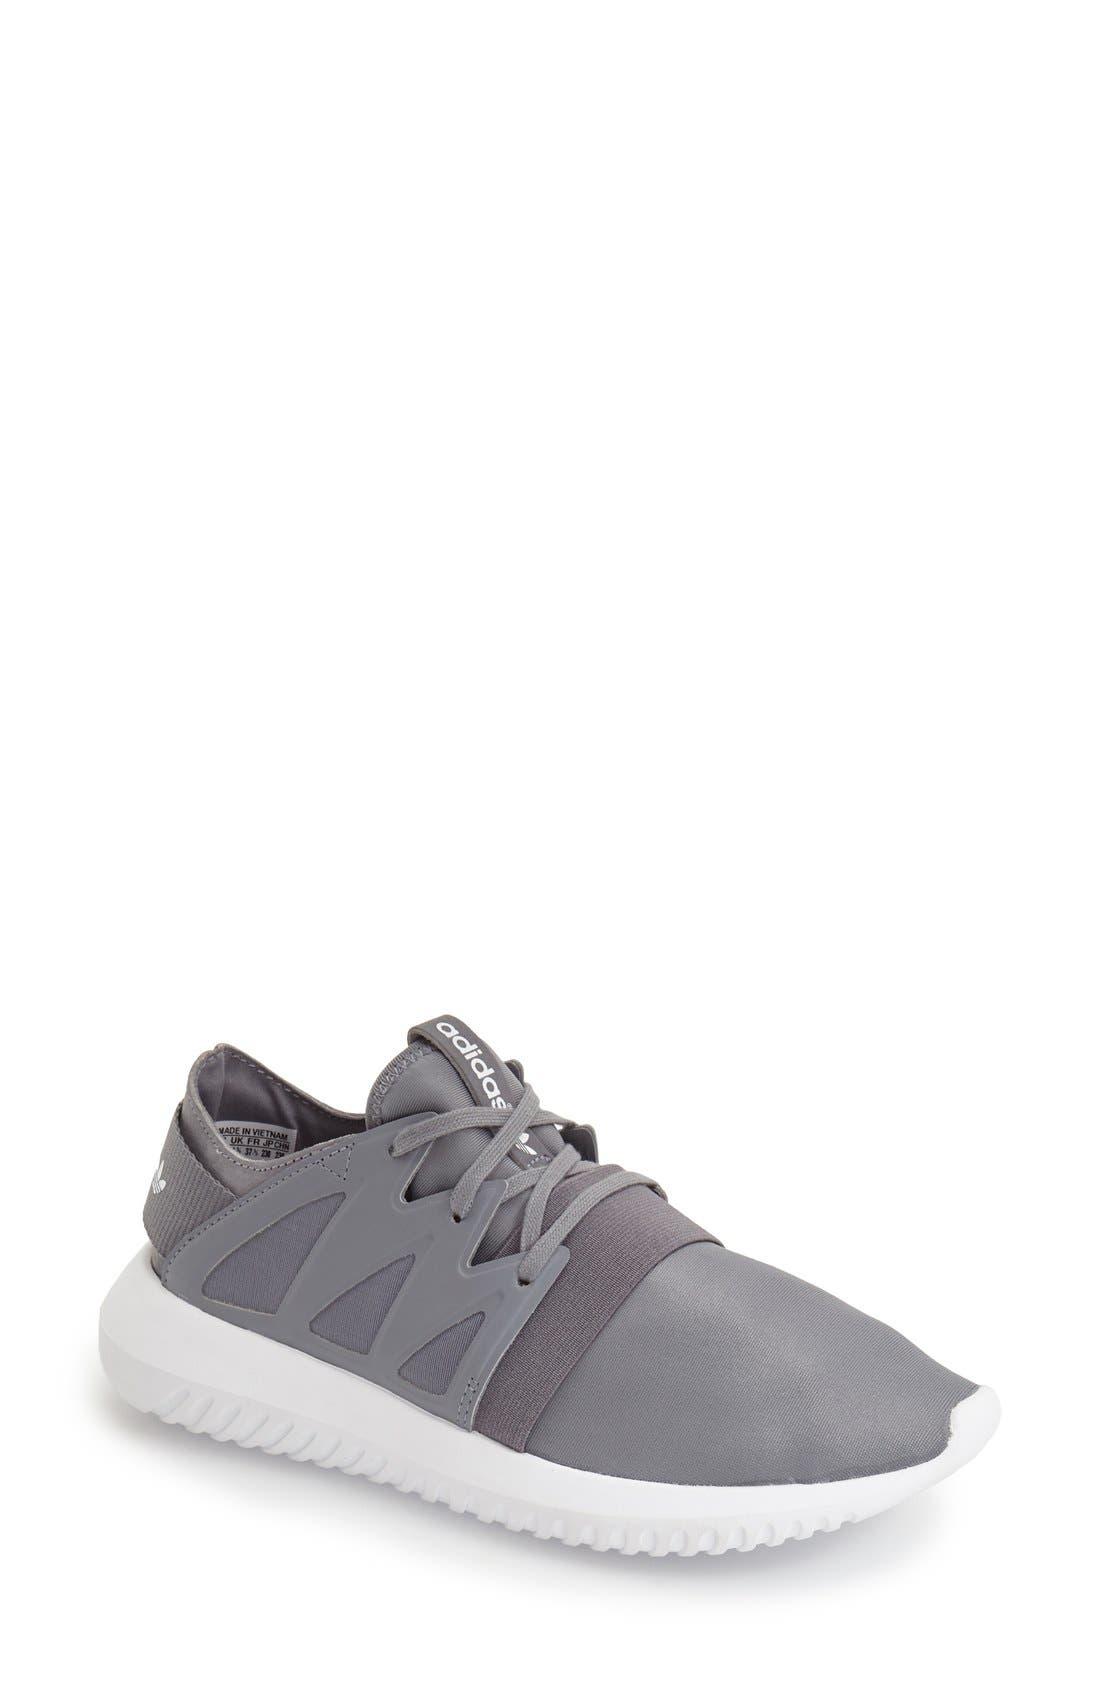 Alternate Image 1 Selected - adidas 'Tubular Viral' Sneaker (Women)